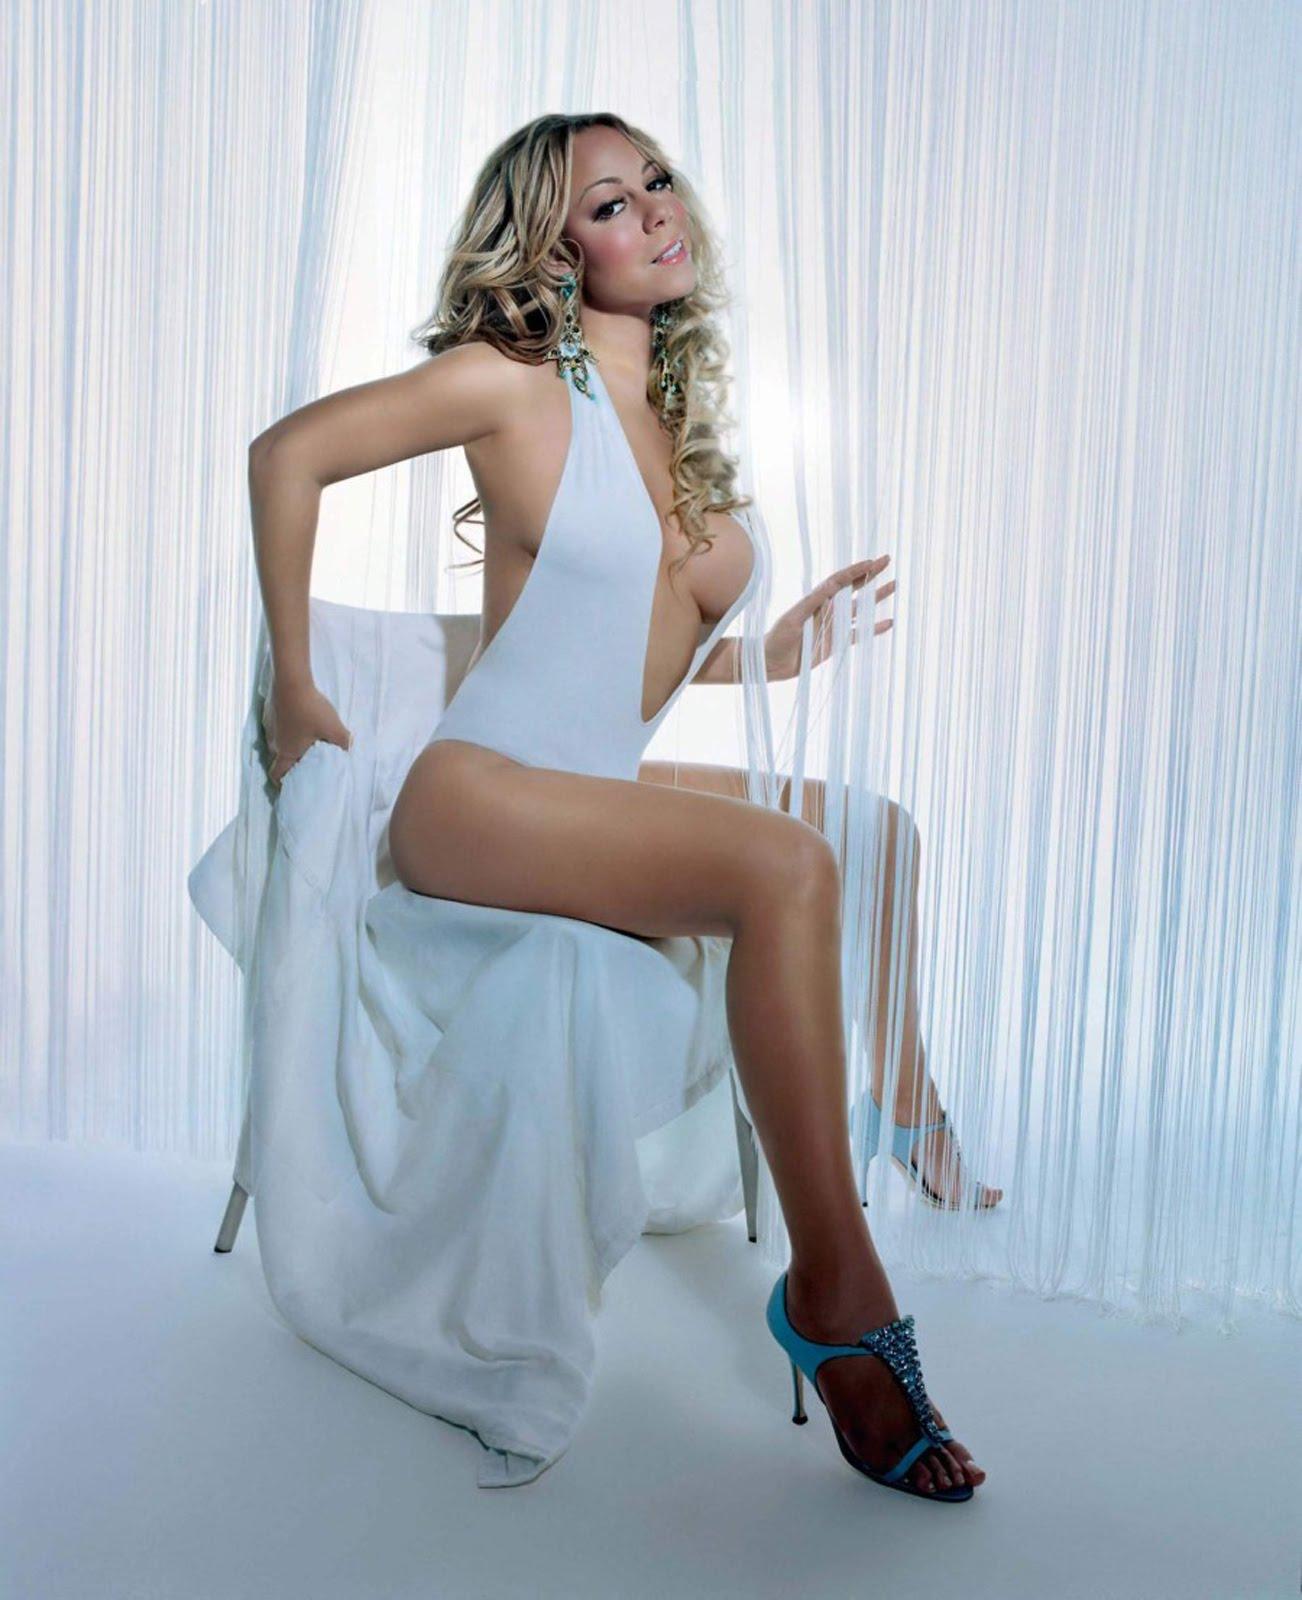 http://4.bp.blogspot.com/_te_-NCYOffc/SxSR3VWkmaI/AAAAAAAABG8/pE767iXyUx8/s1600/sexy_Mariah_Carey_02.jpg